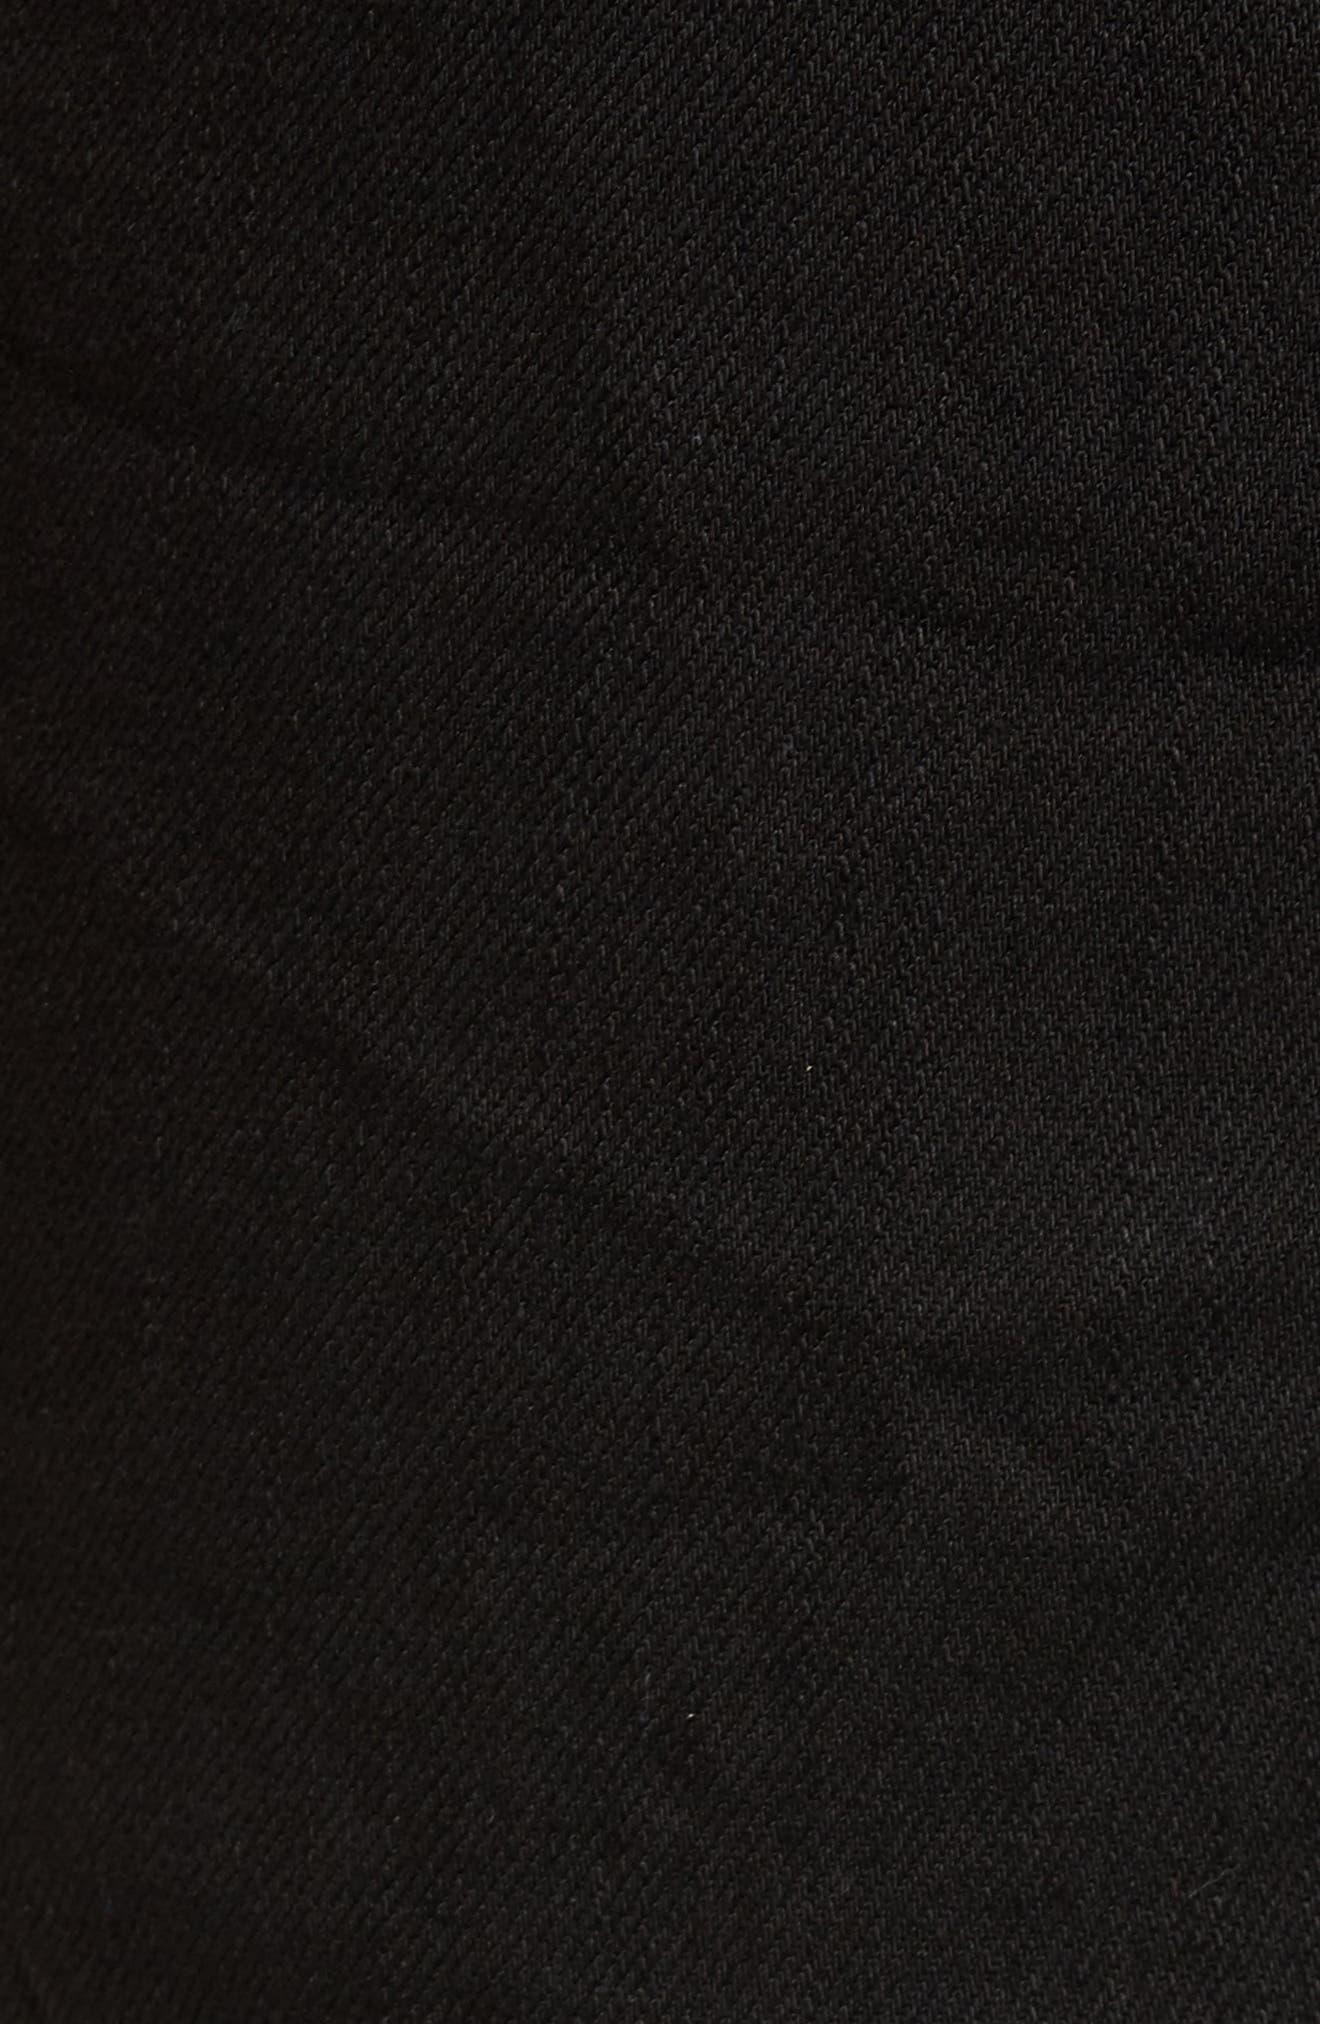 B.Line Crop Slim Fit Jeans,                             Alternate thumbnail 5, color,                             Washed Black